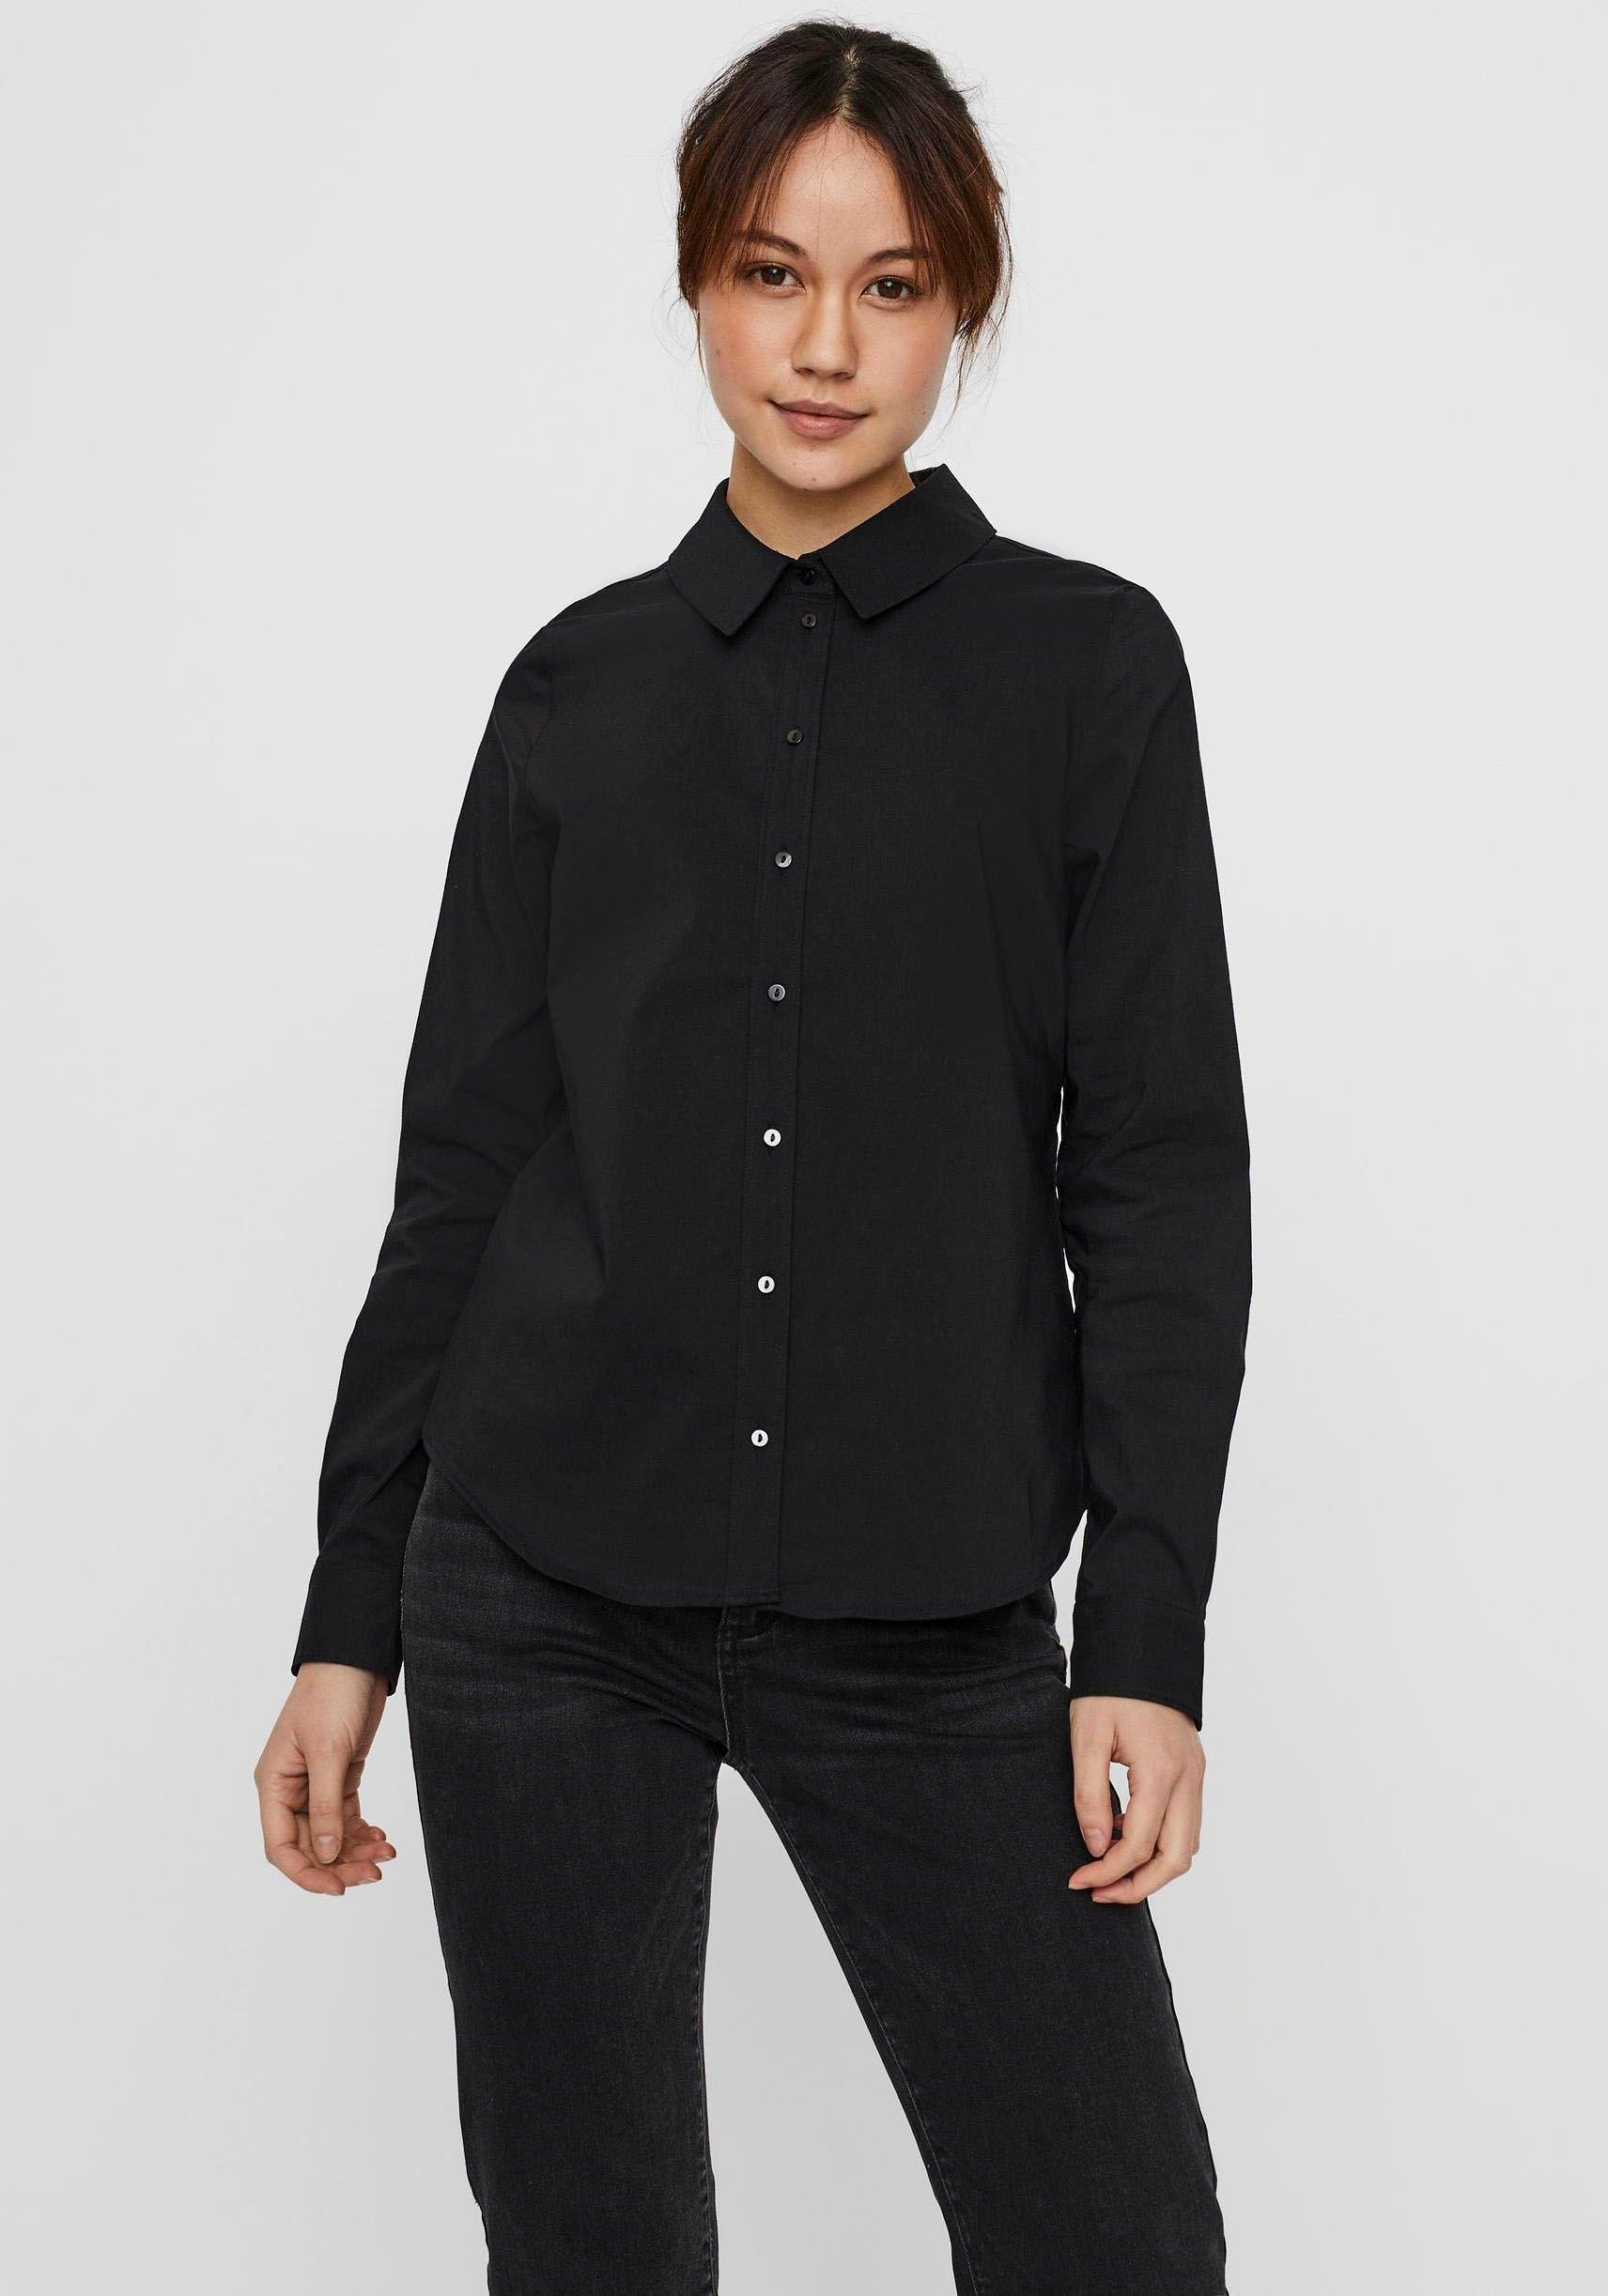 Vero Moda klassieke blouse VMJULIE - verschillende betaalmethodes